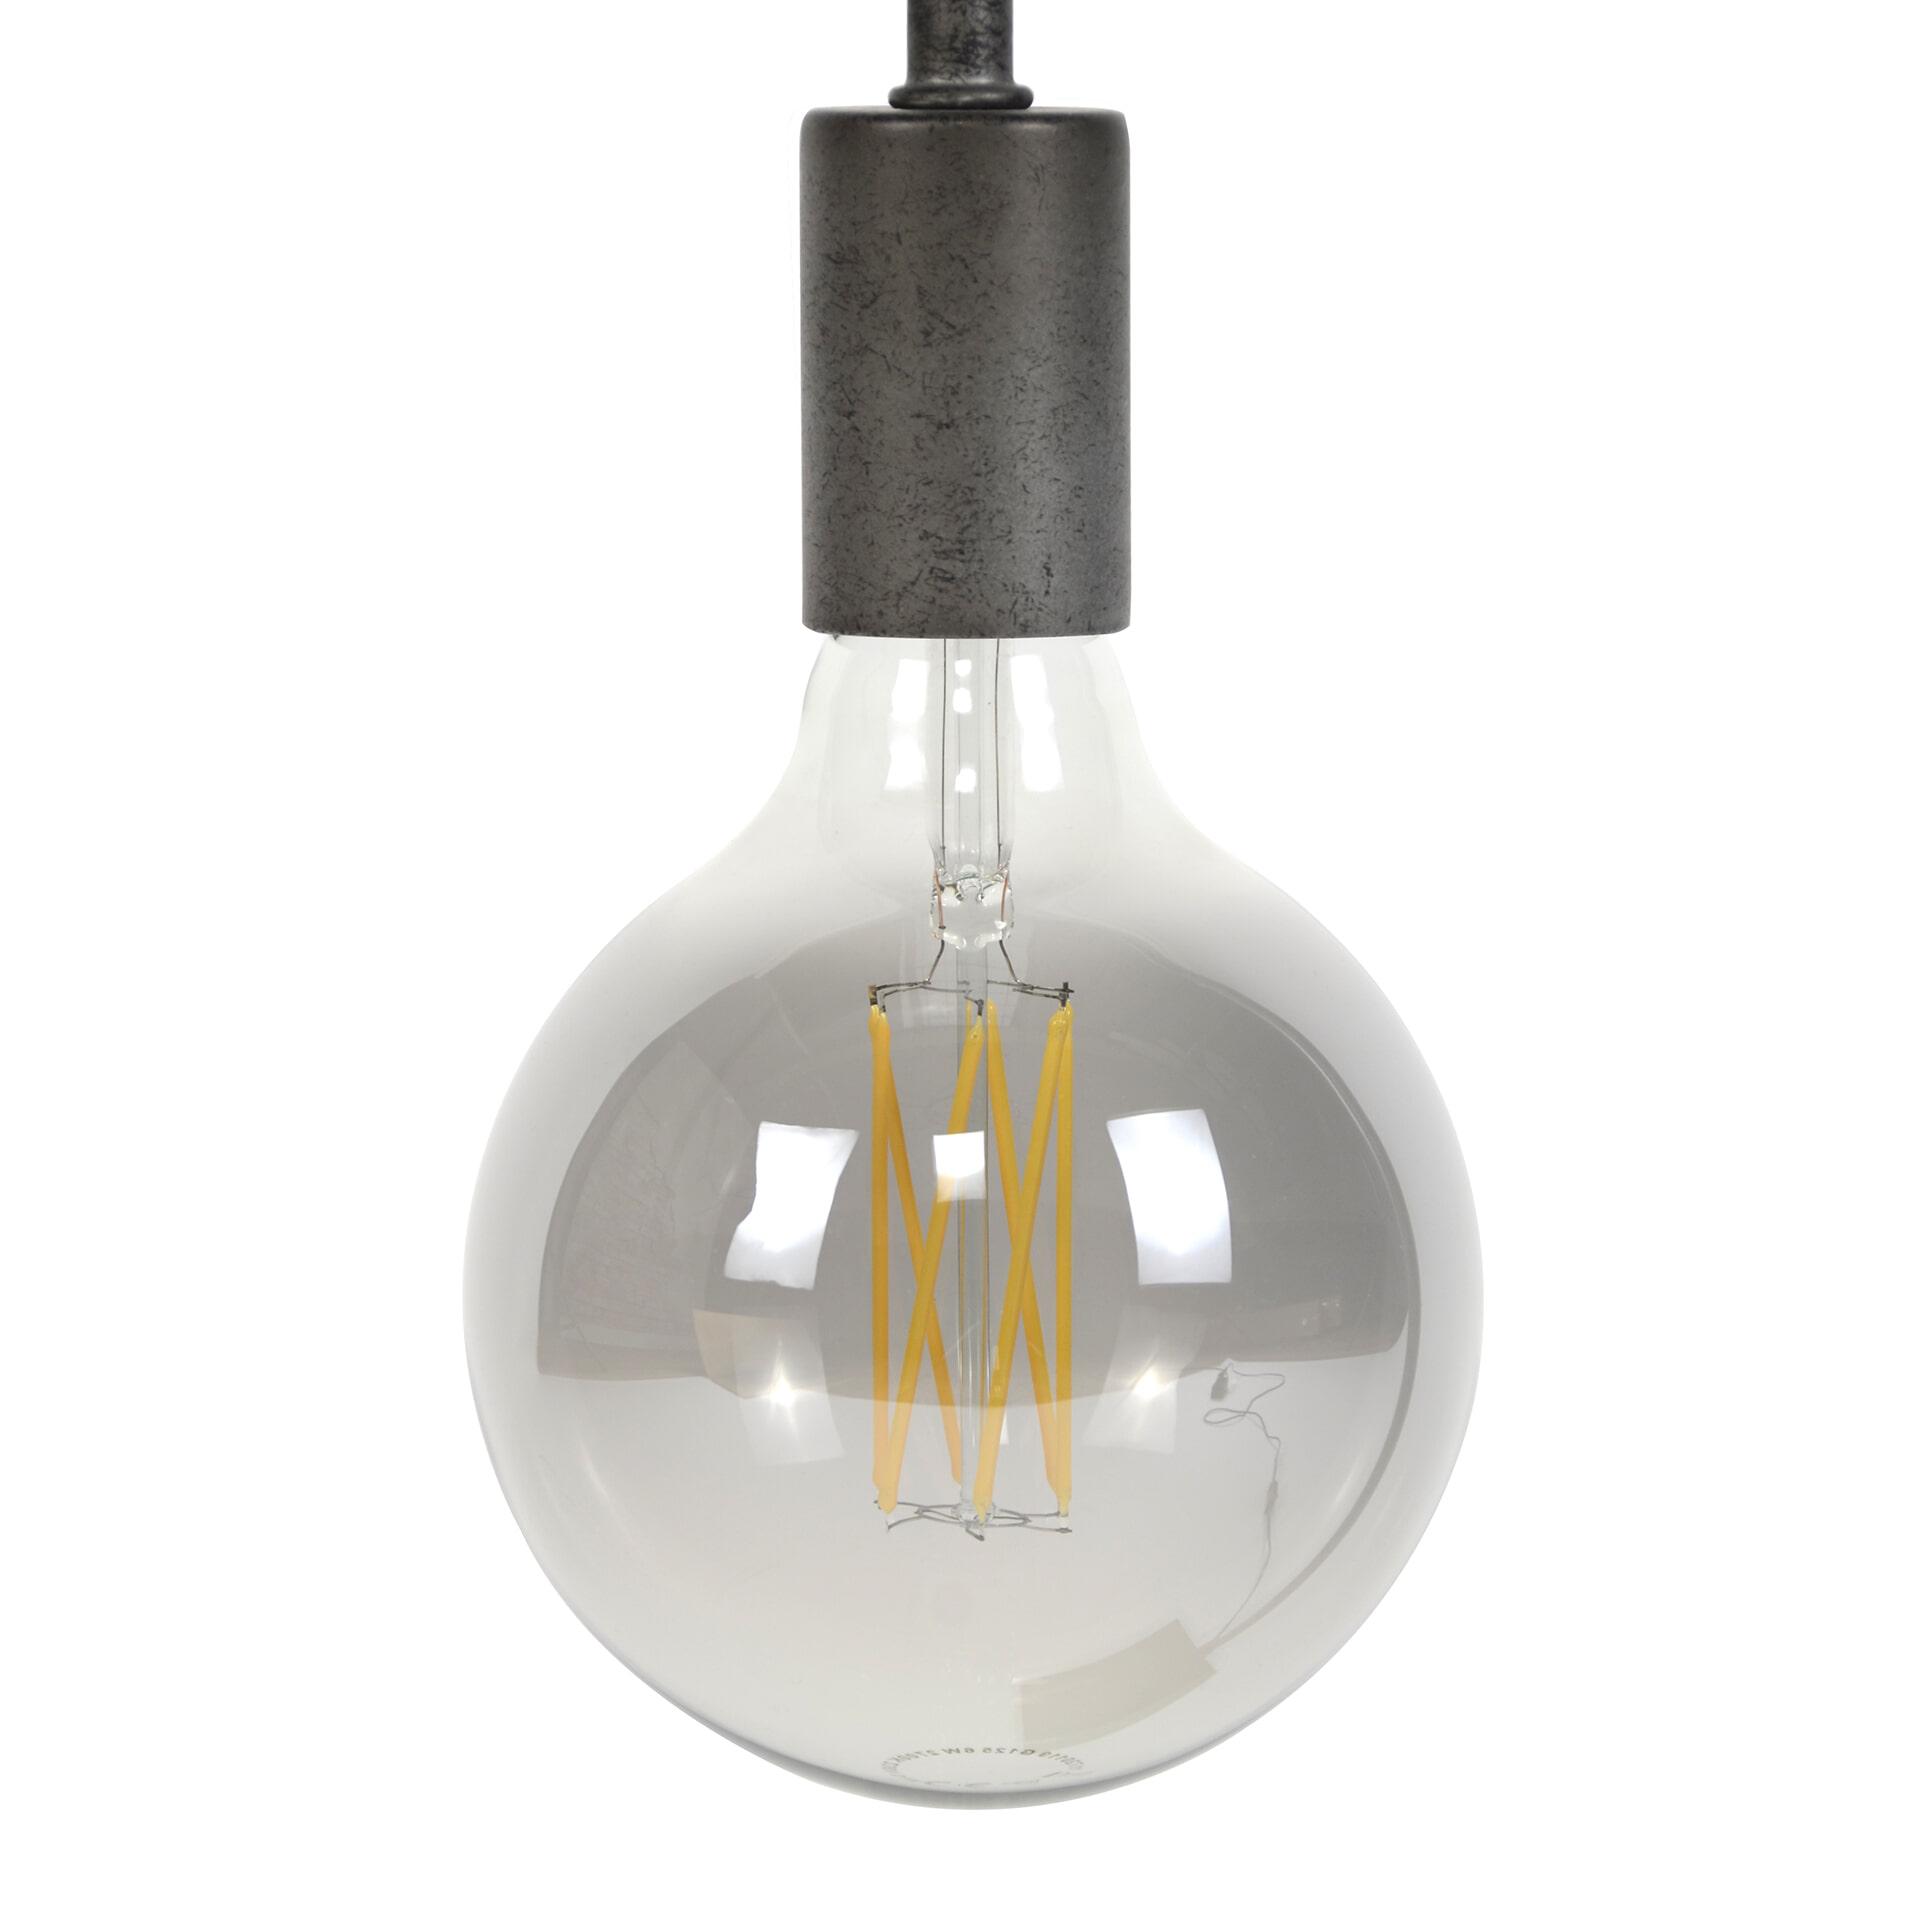 Kooldraadlamp 'Bol XL' Ø12cm E27 LED 6W, kleur Smoke Grey, dimbaar